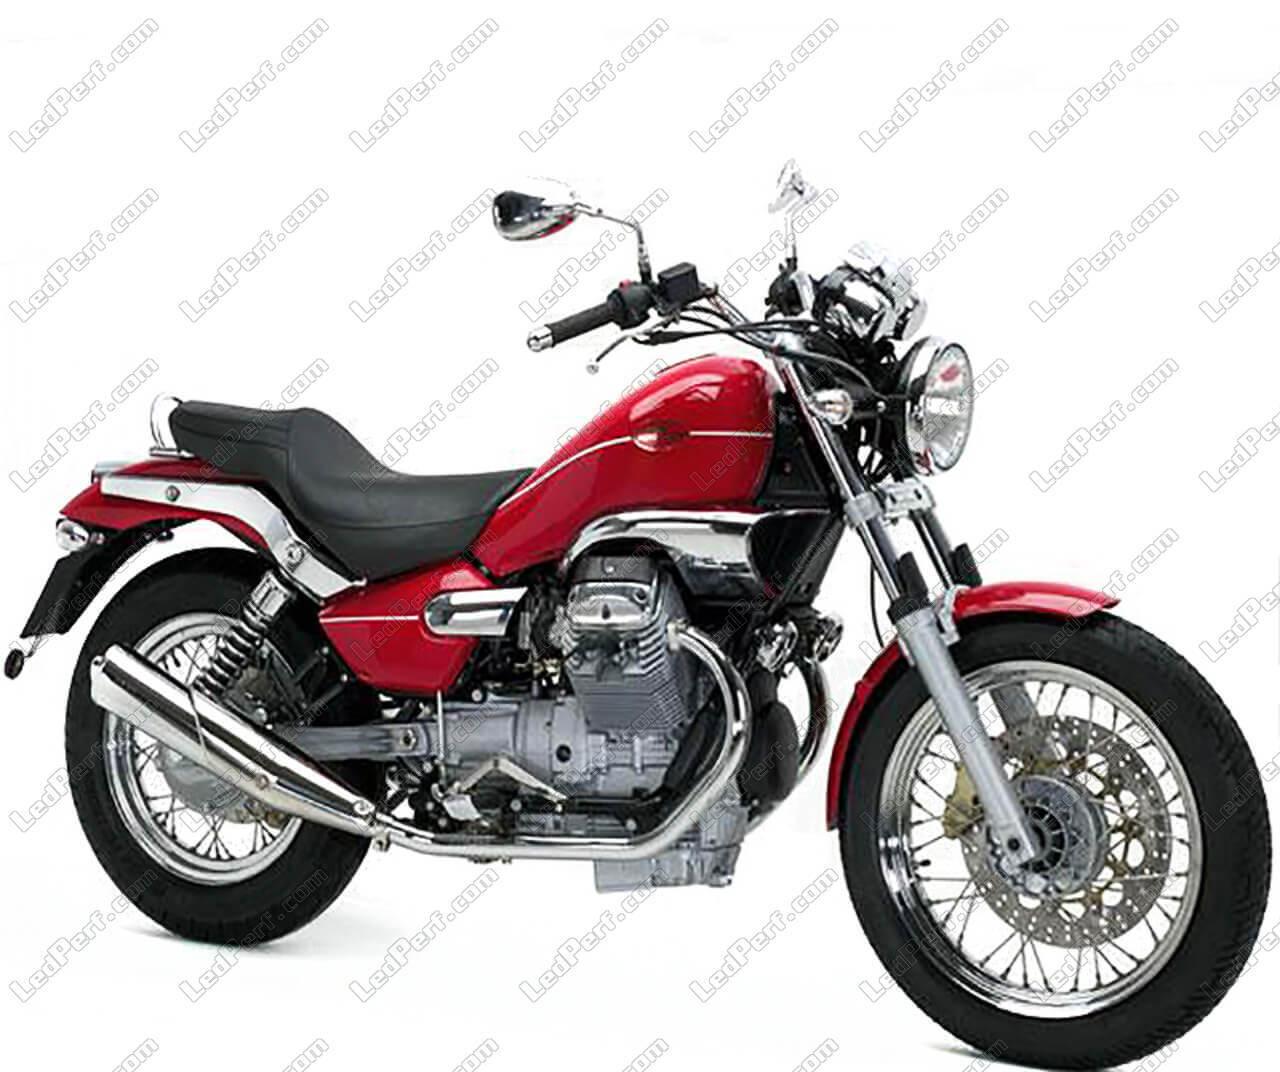 phares additionnels led pour moto moto guzzi nevada club 750. Black Bedroom Furniture Sets. Home Design Ideas